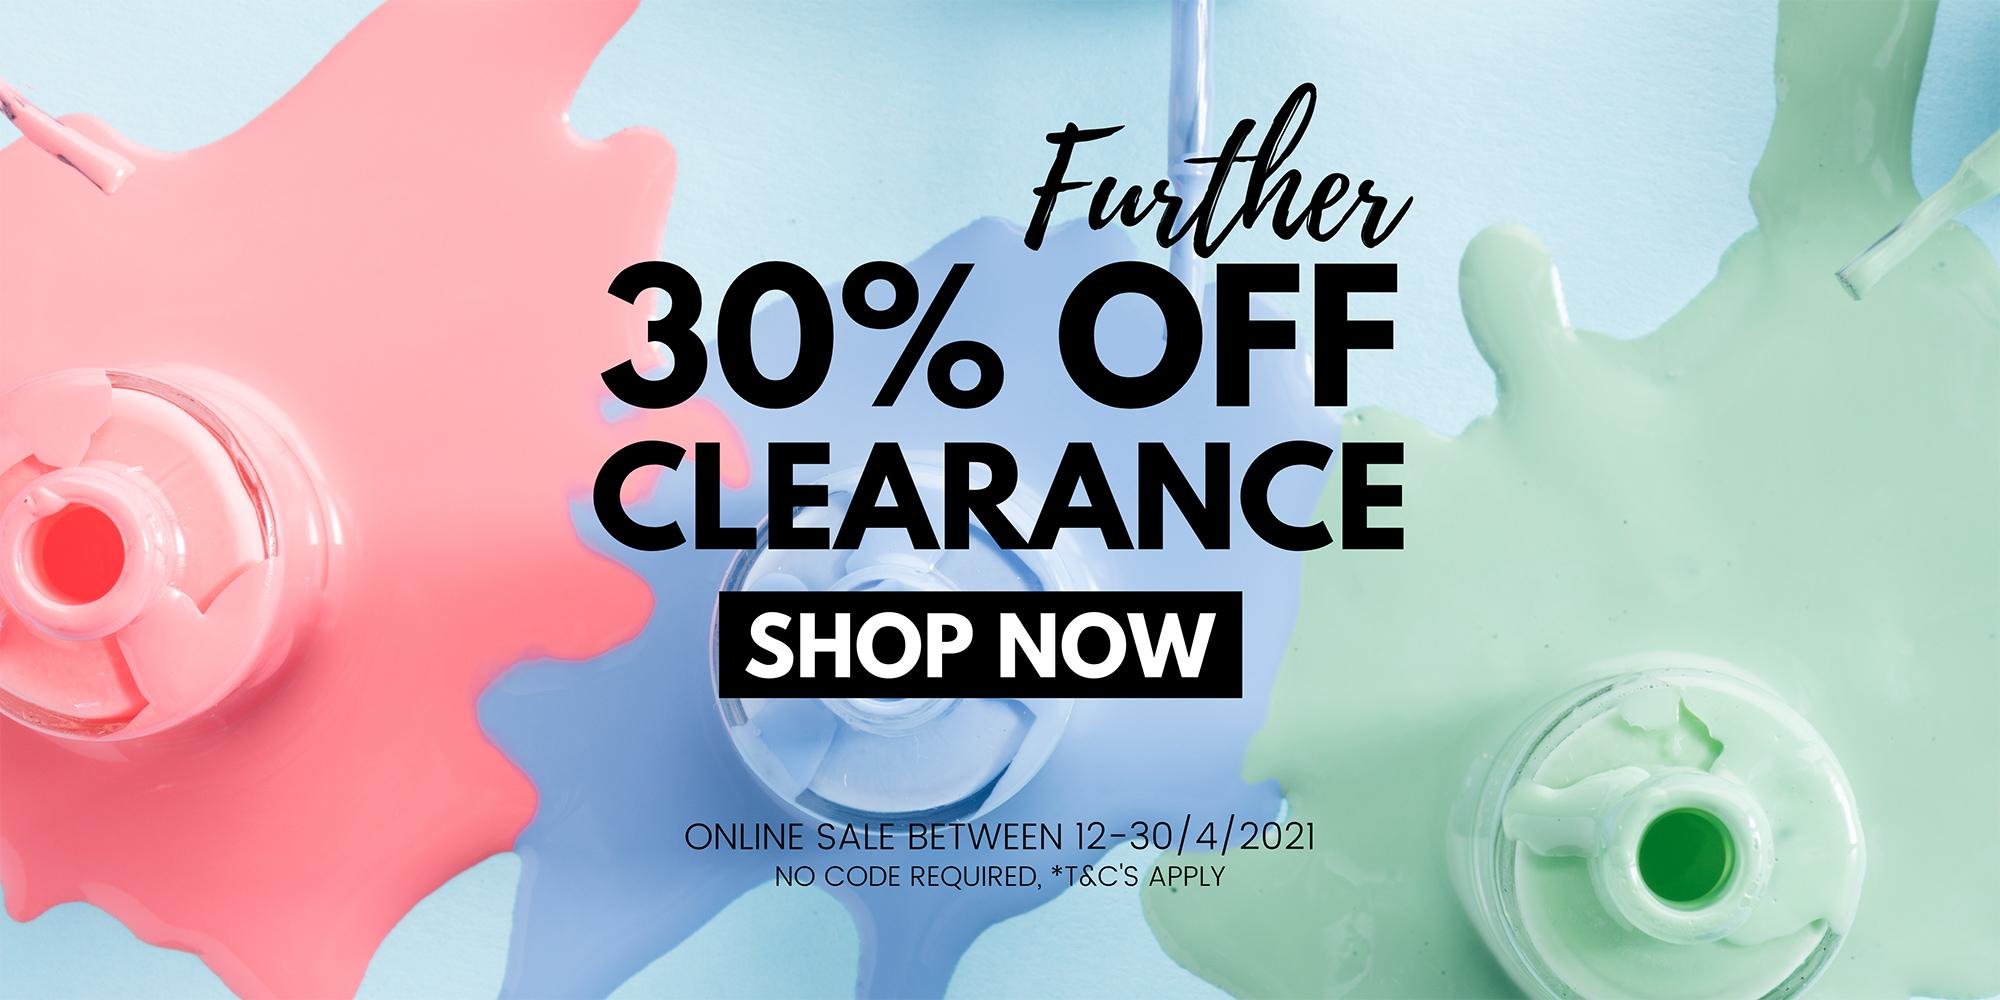 30% off clearance sale diamond nail supplies sydney online shop australia shipping